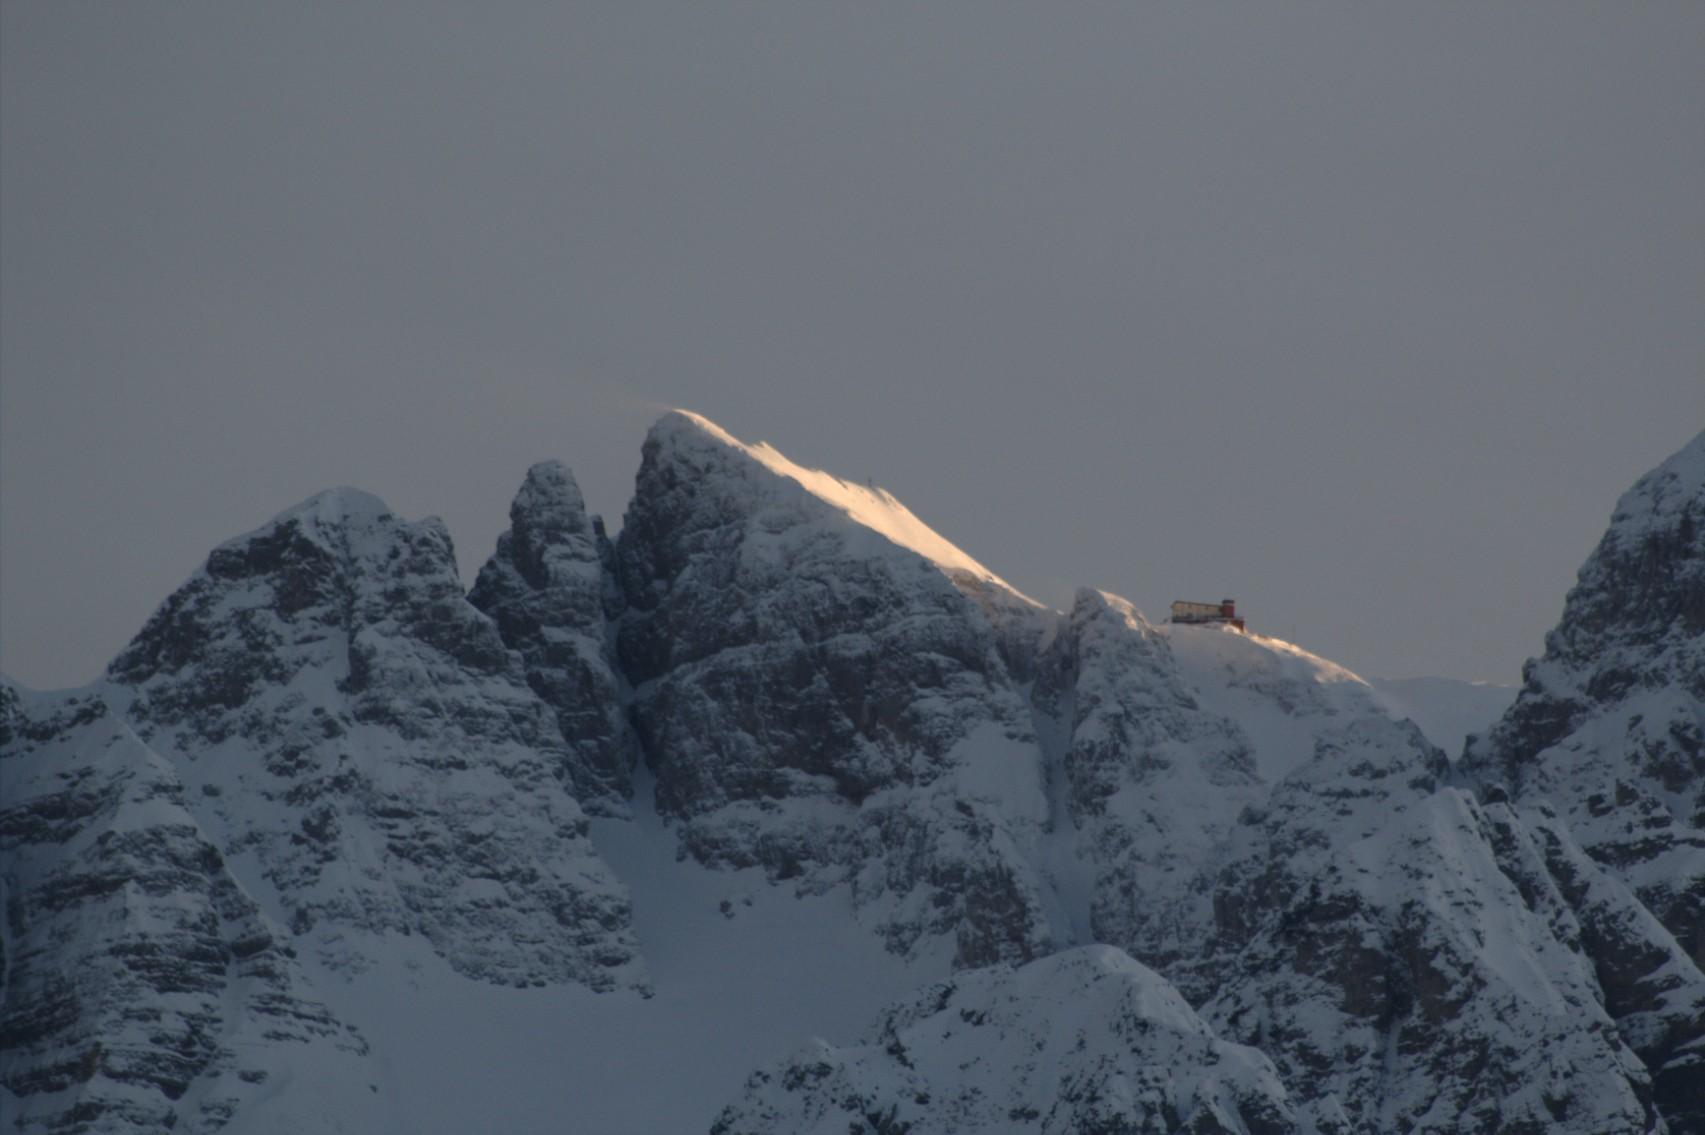 Tramonto sul Fraccaroli